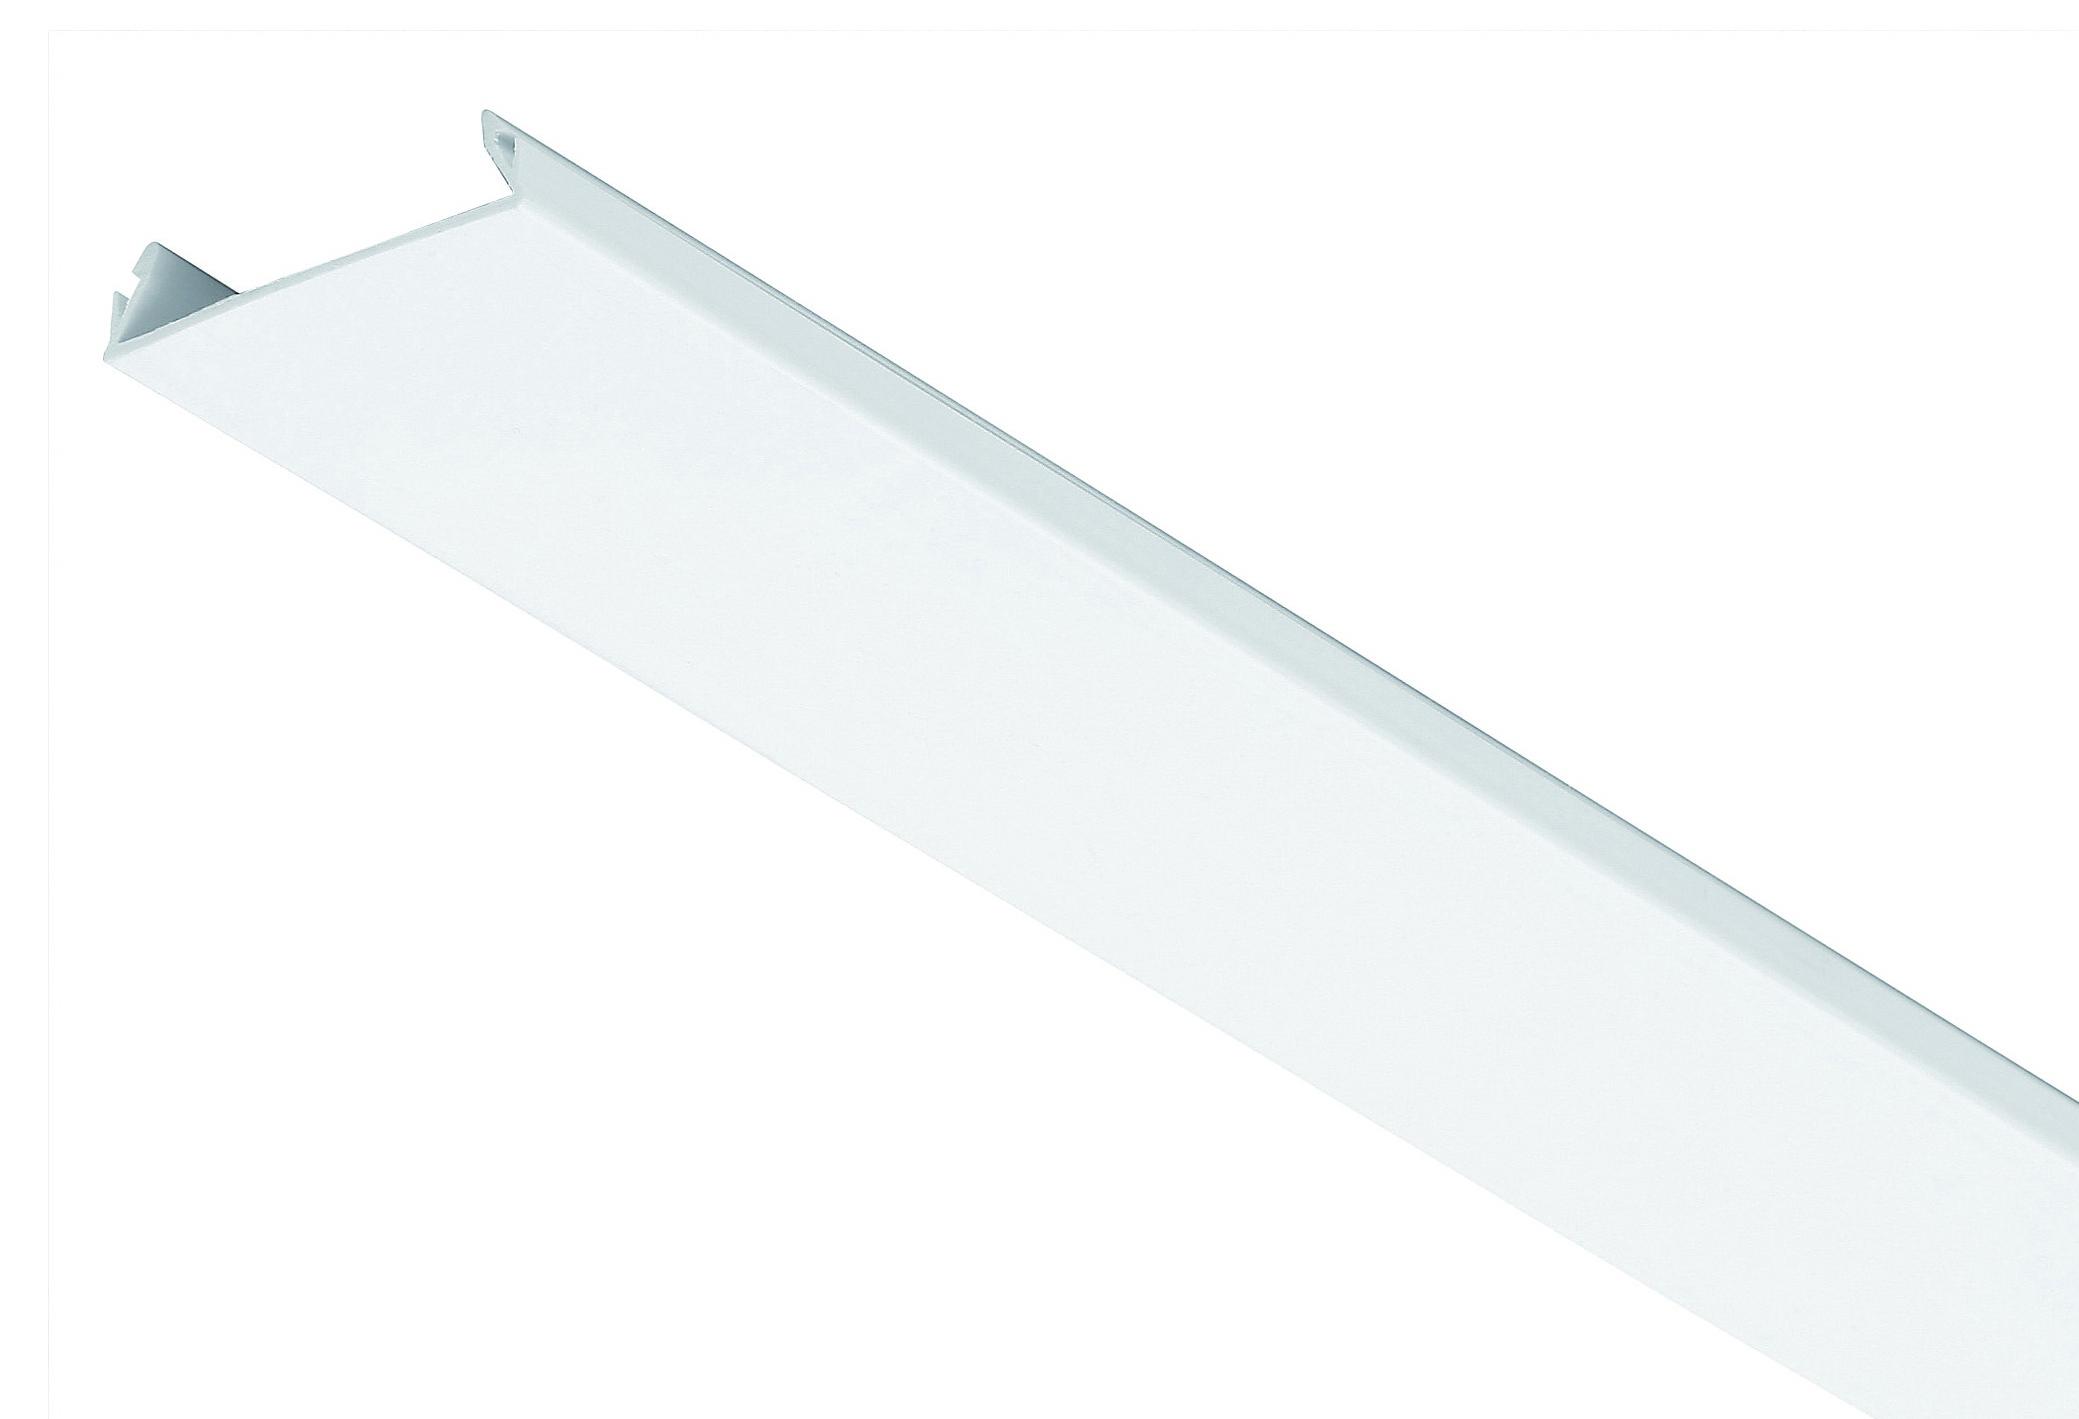 1 Stk L-SE Blindabdeckung DM T5 aus Kunststoff, Weiß LI99000063